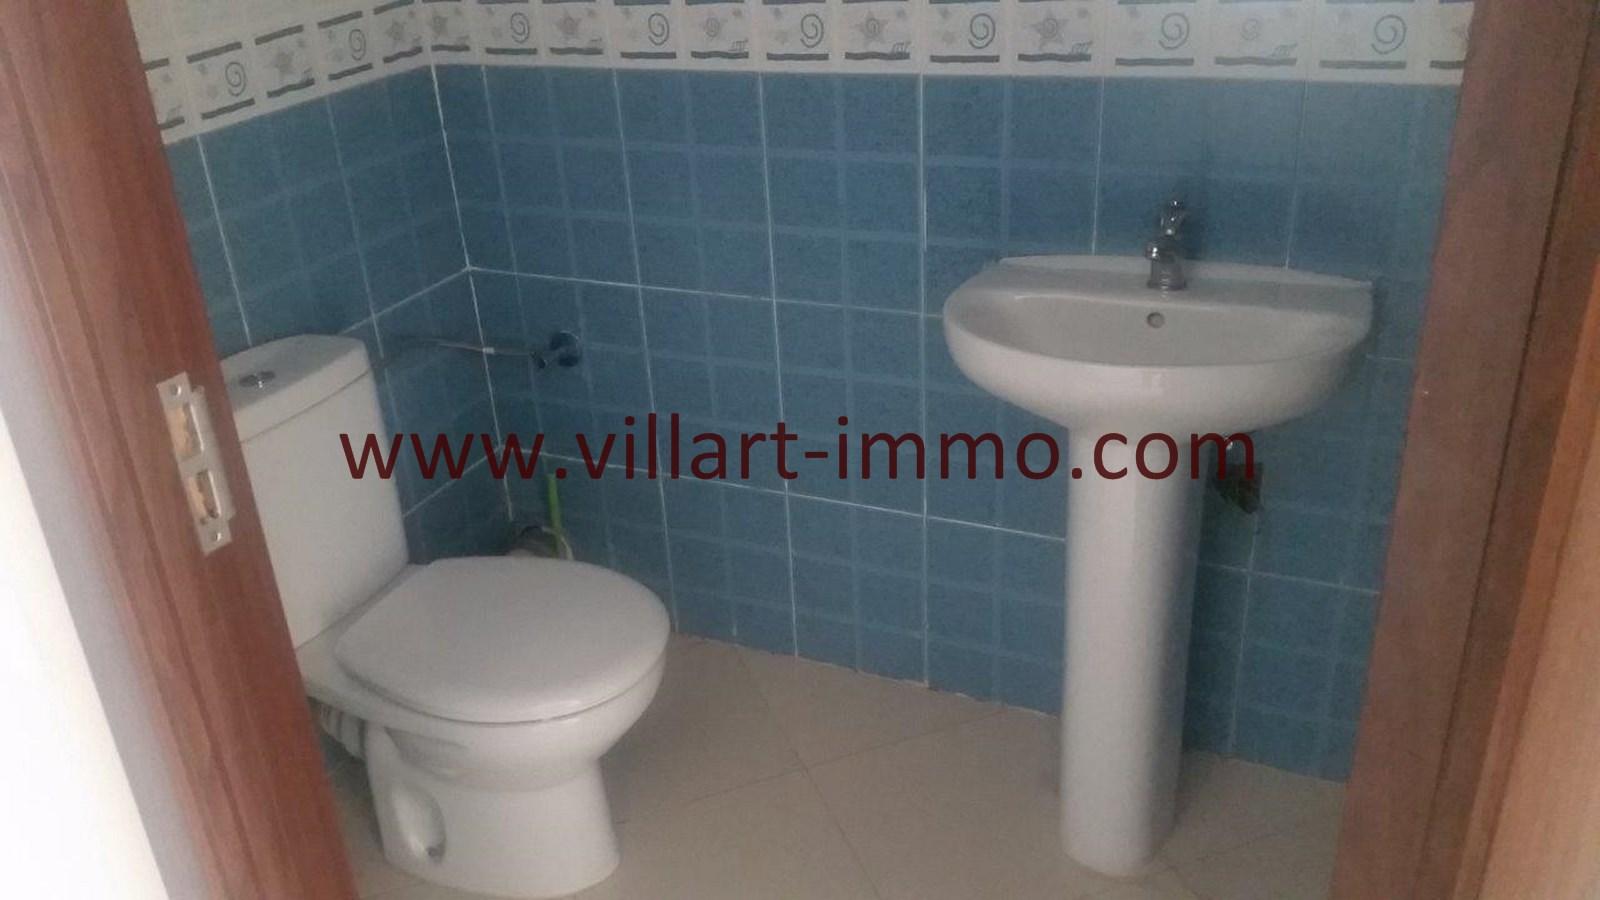 5-location-appartement-meuble-tanger-salle-de-bain-1-l955-villart-immo